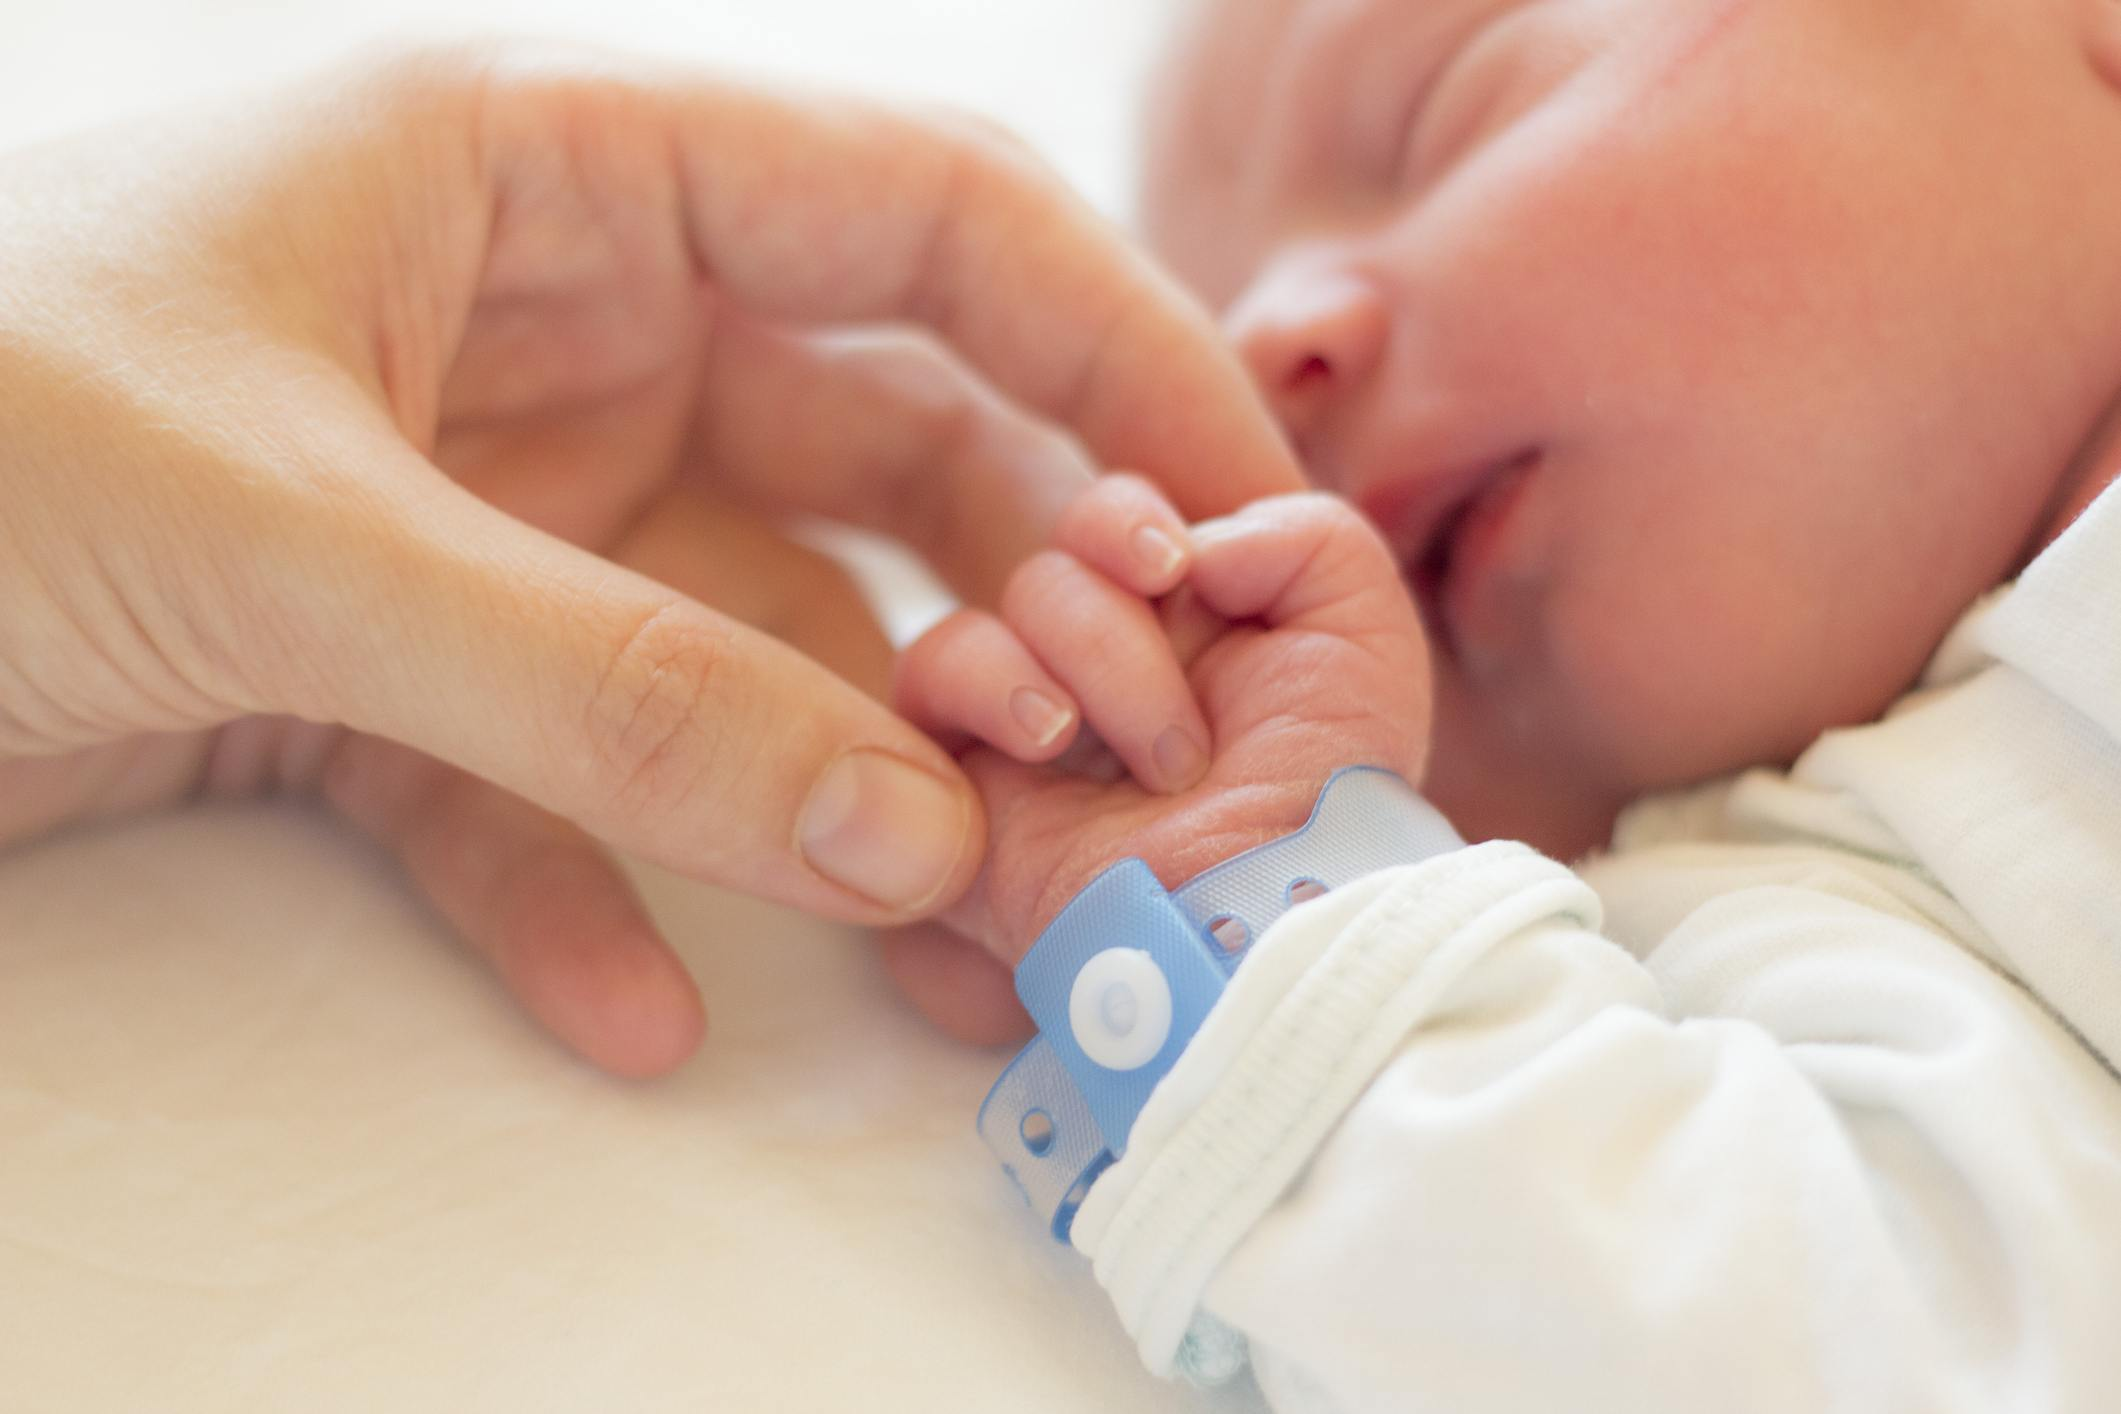 Newborn baby holding a hand